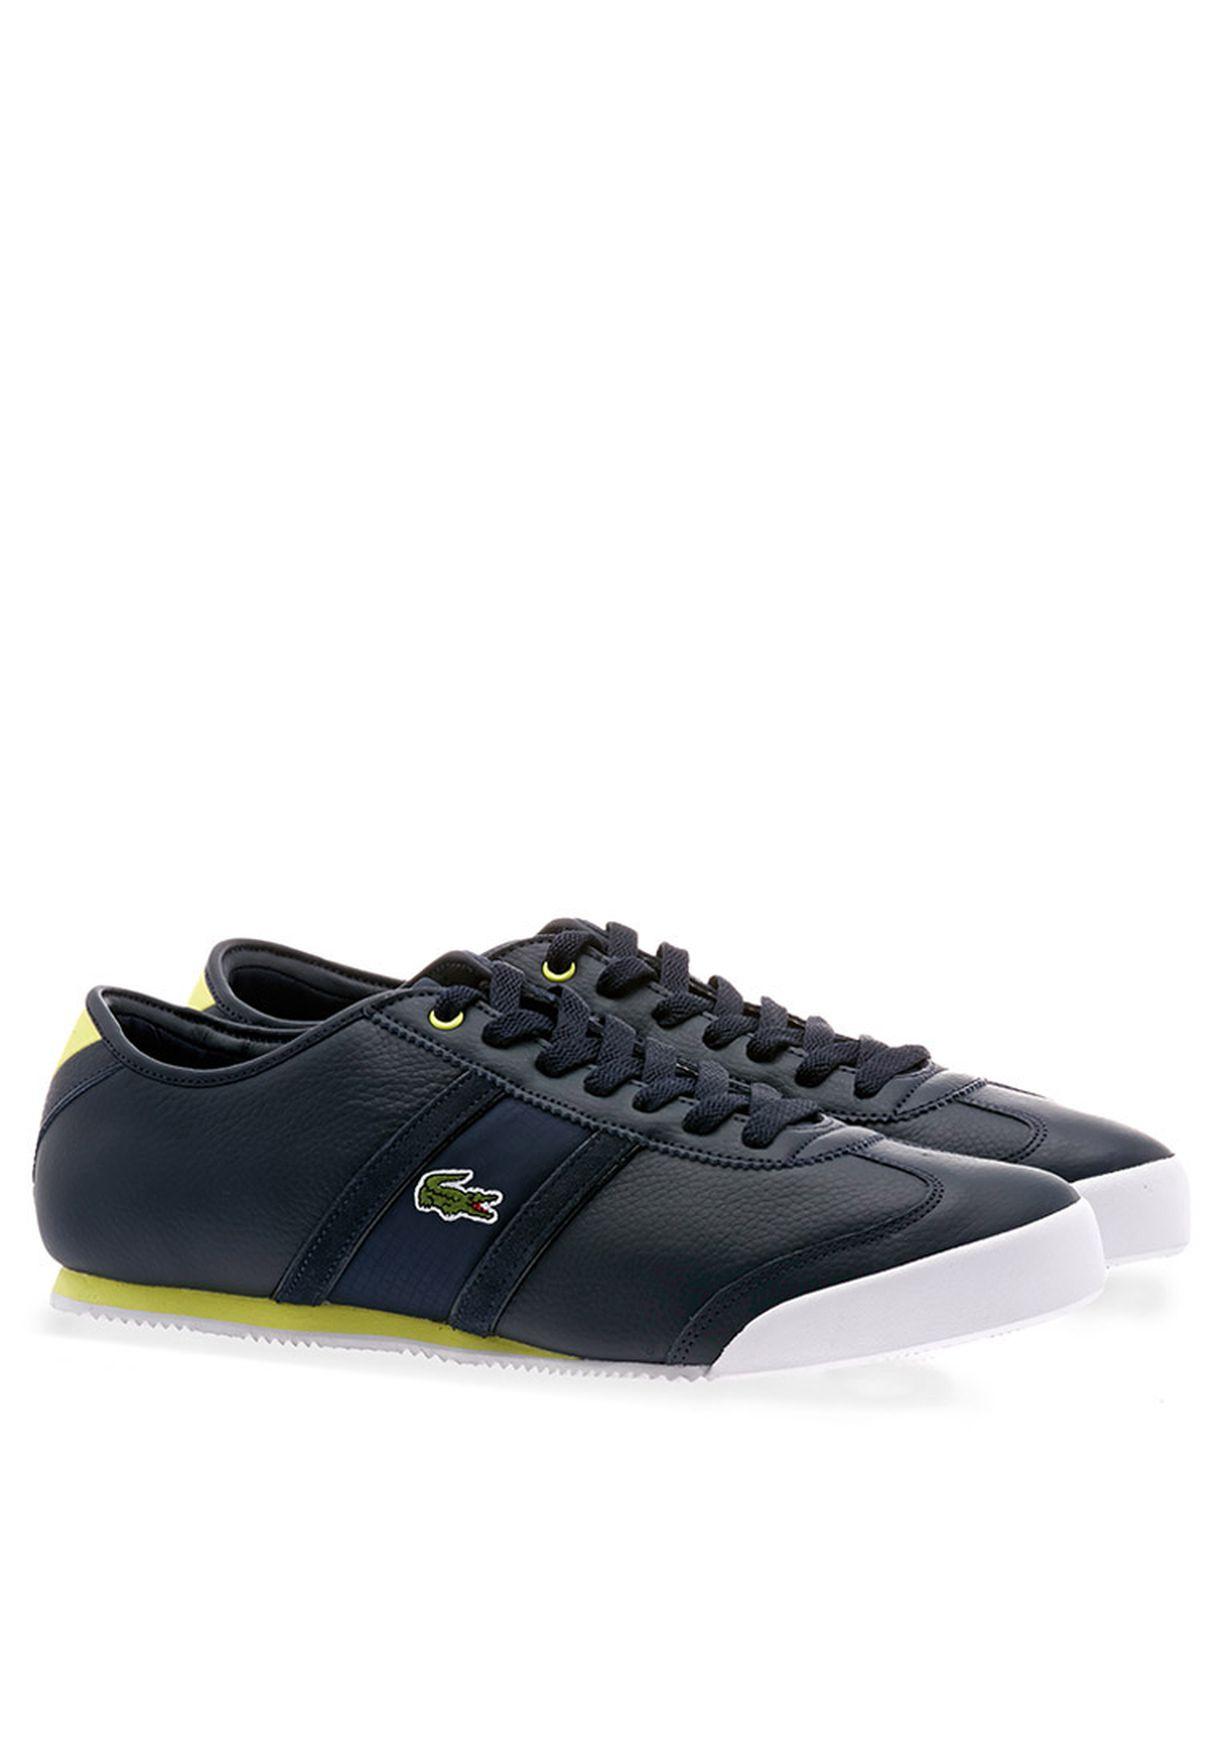 kup popularne Nowa kolekcja wiele stylów Tourelle avaLow-top Sneakers